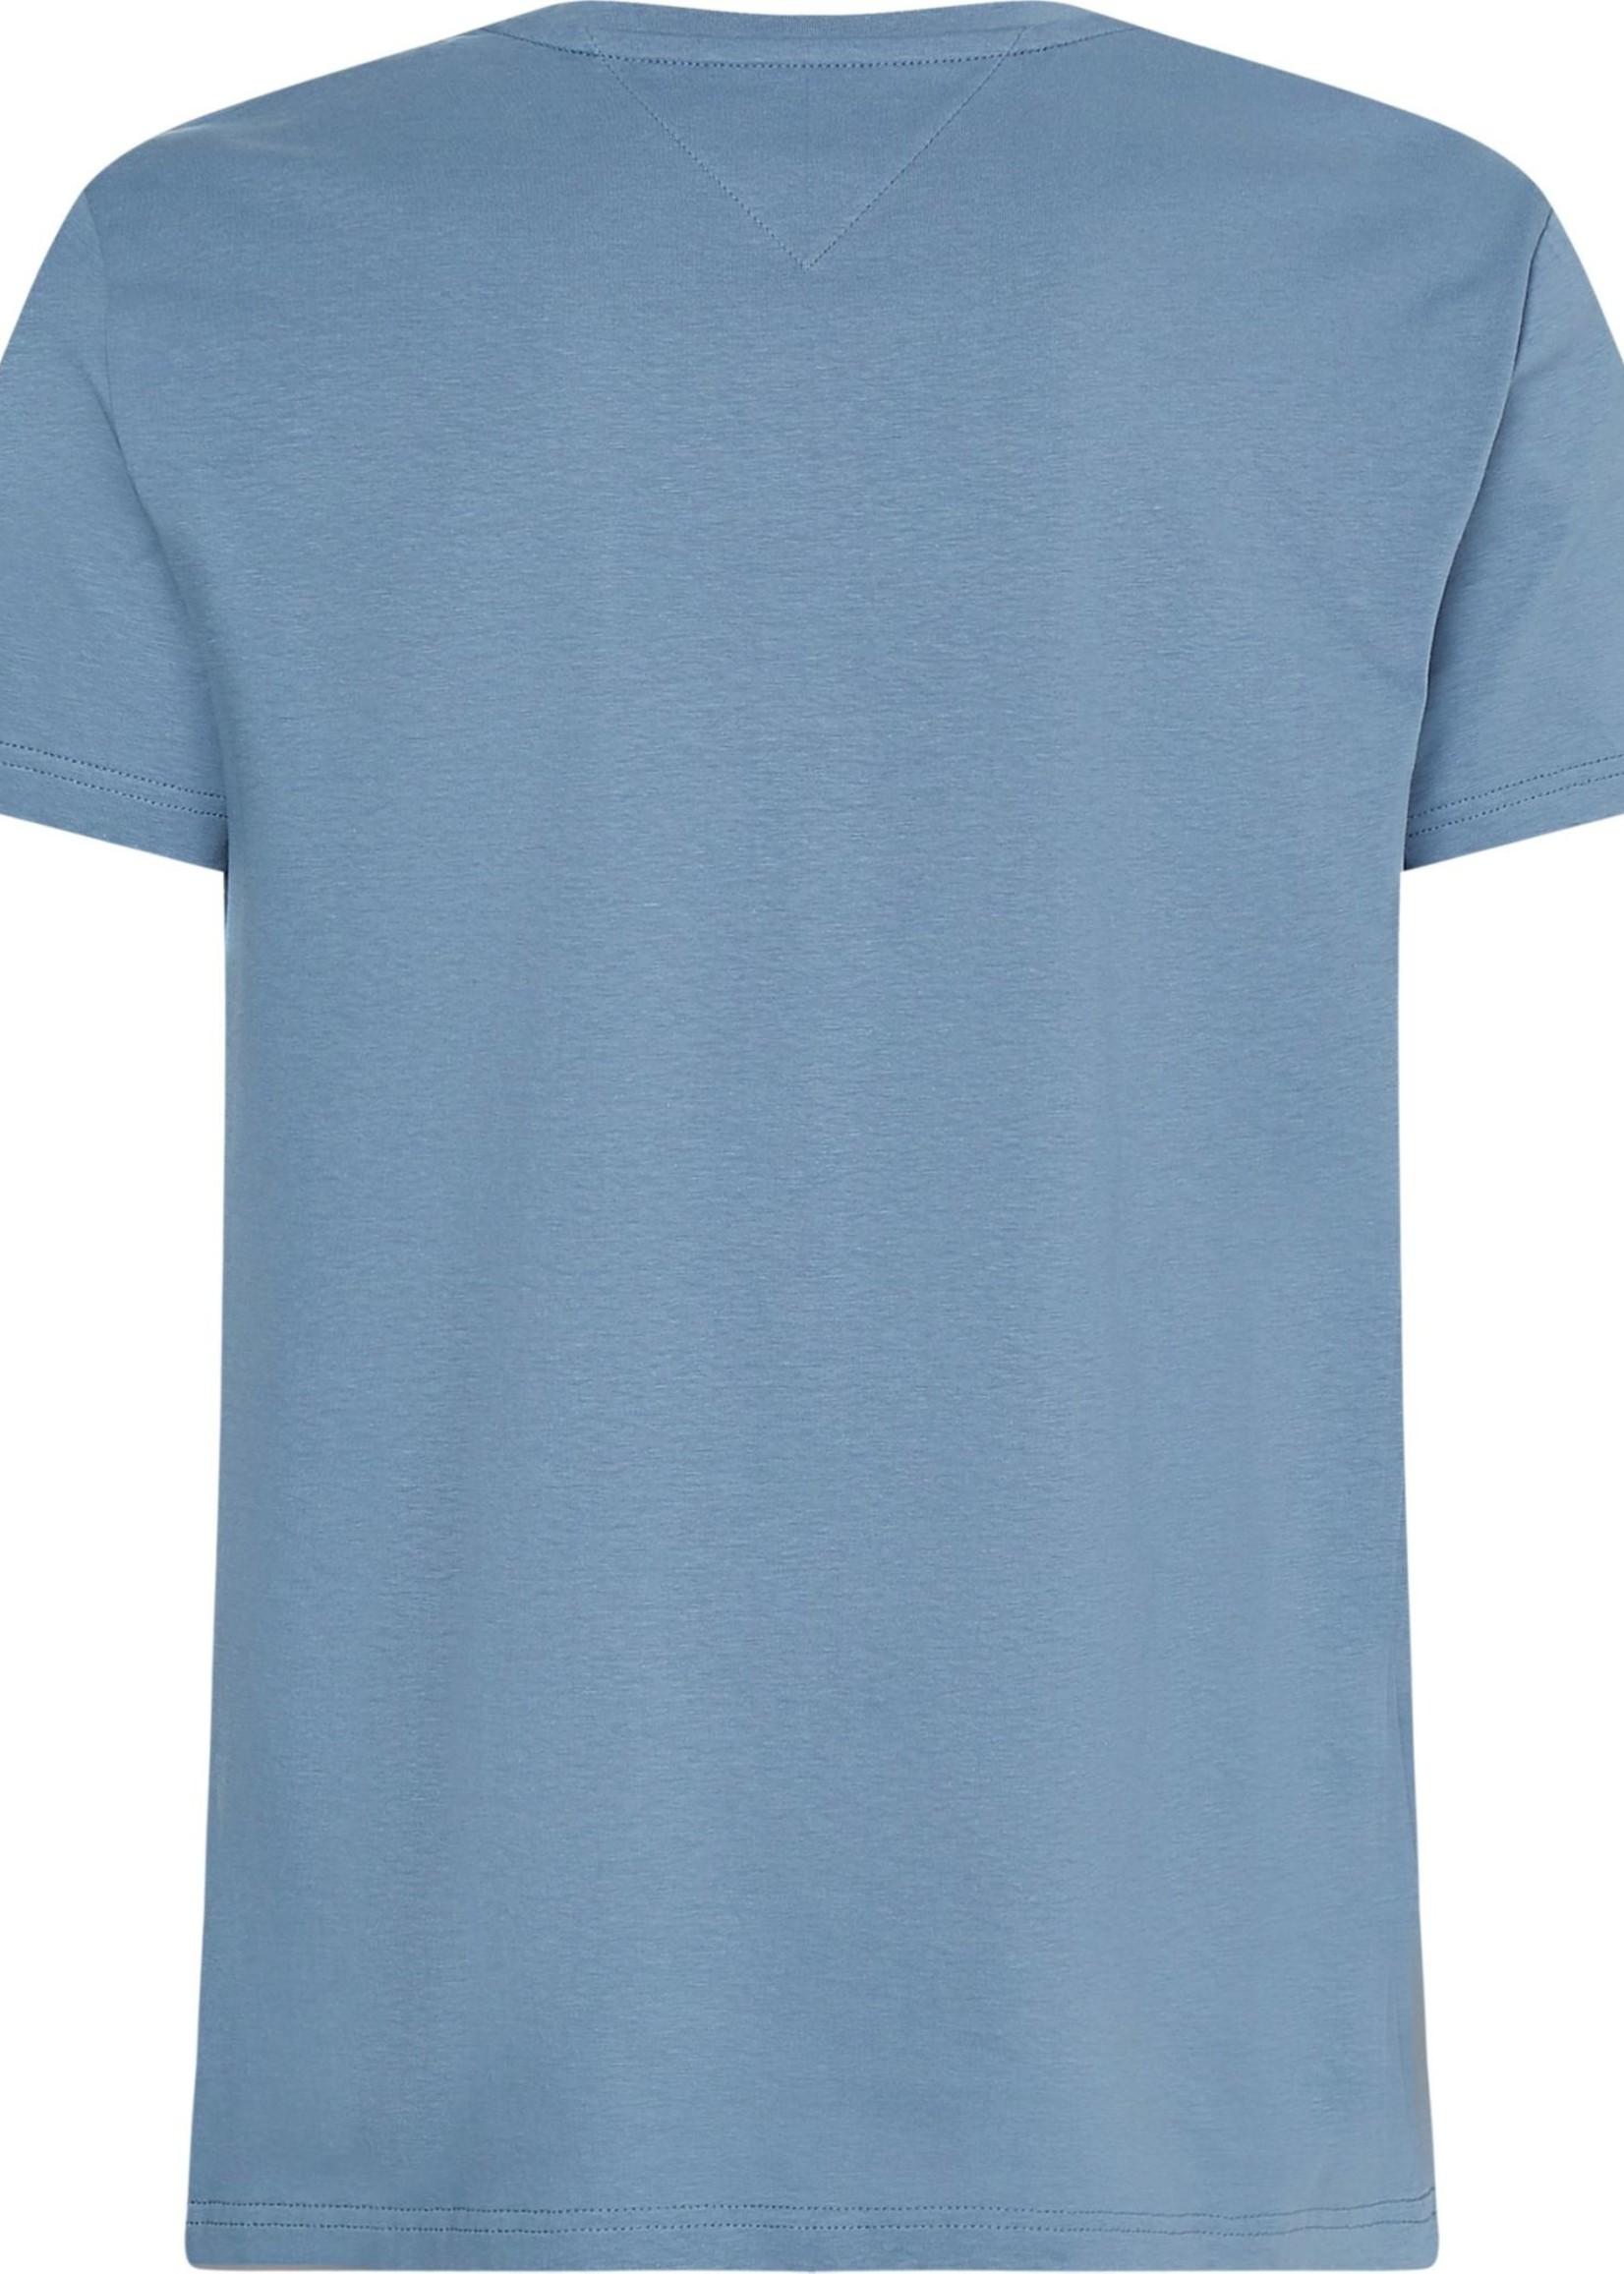 Tommy Hilfiger T-shirt van biologisch katoen met logo | Blauw | Tommy Hilfiger